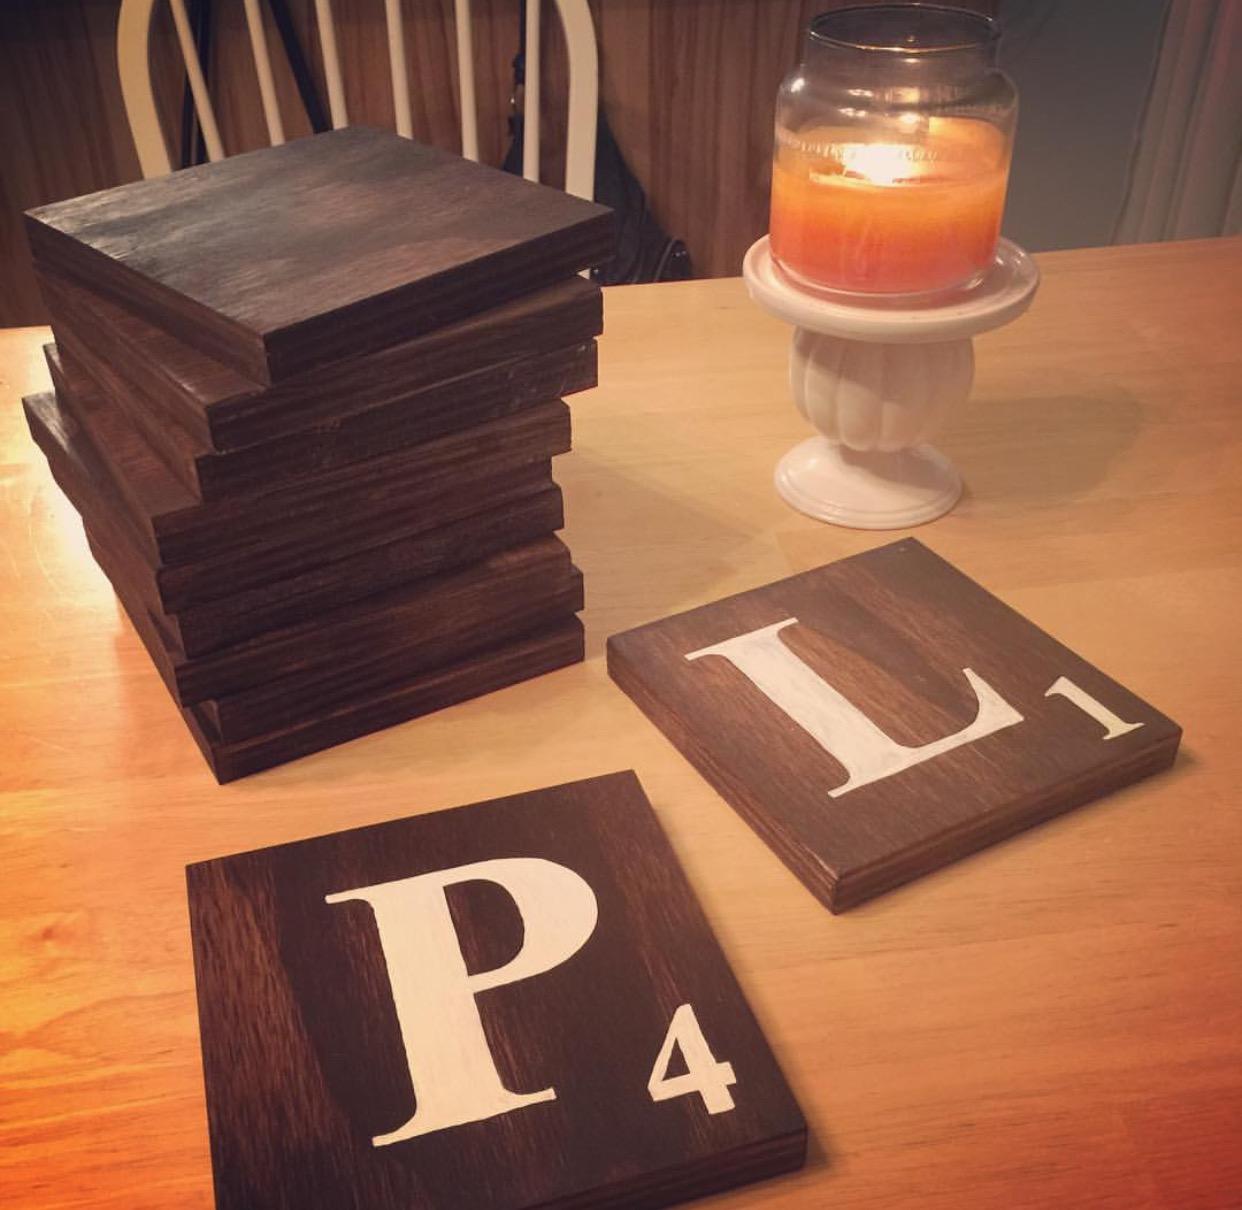 DIY Scrabble Wall Tiles | Rachel & Co.